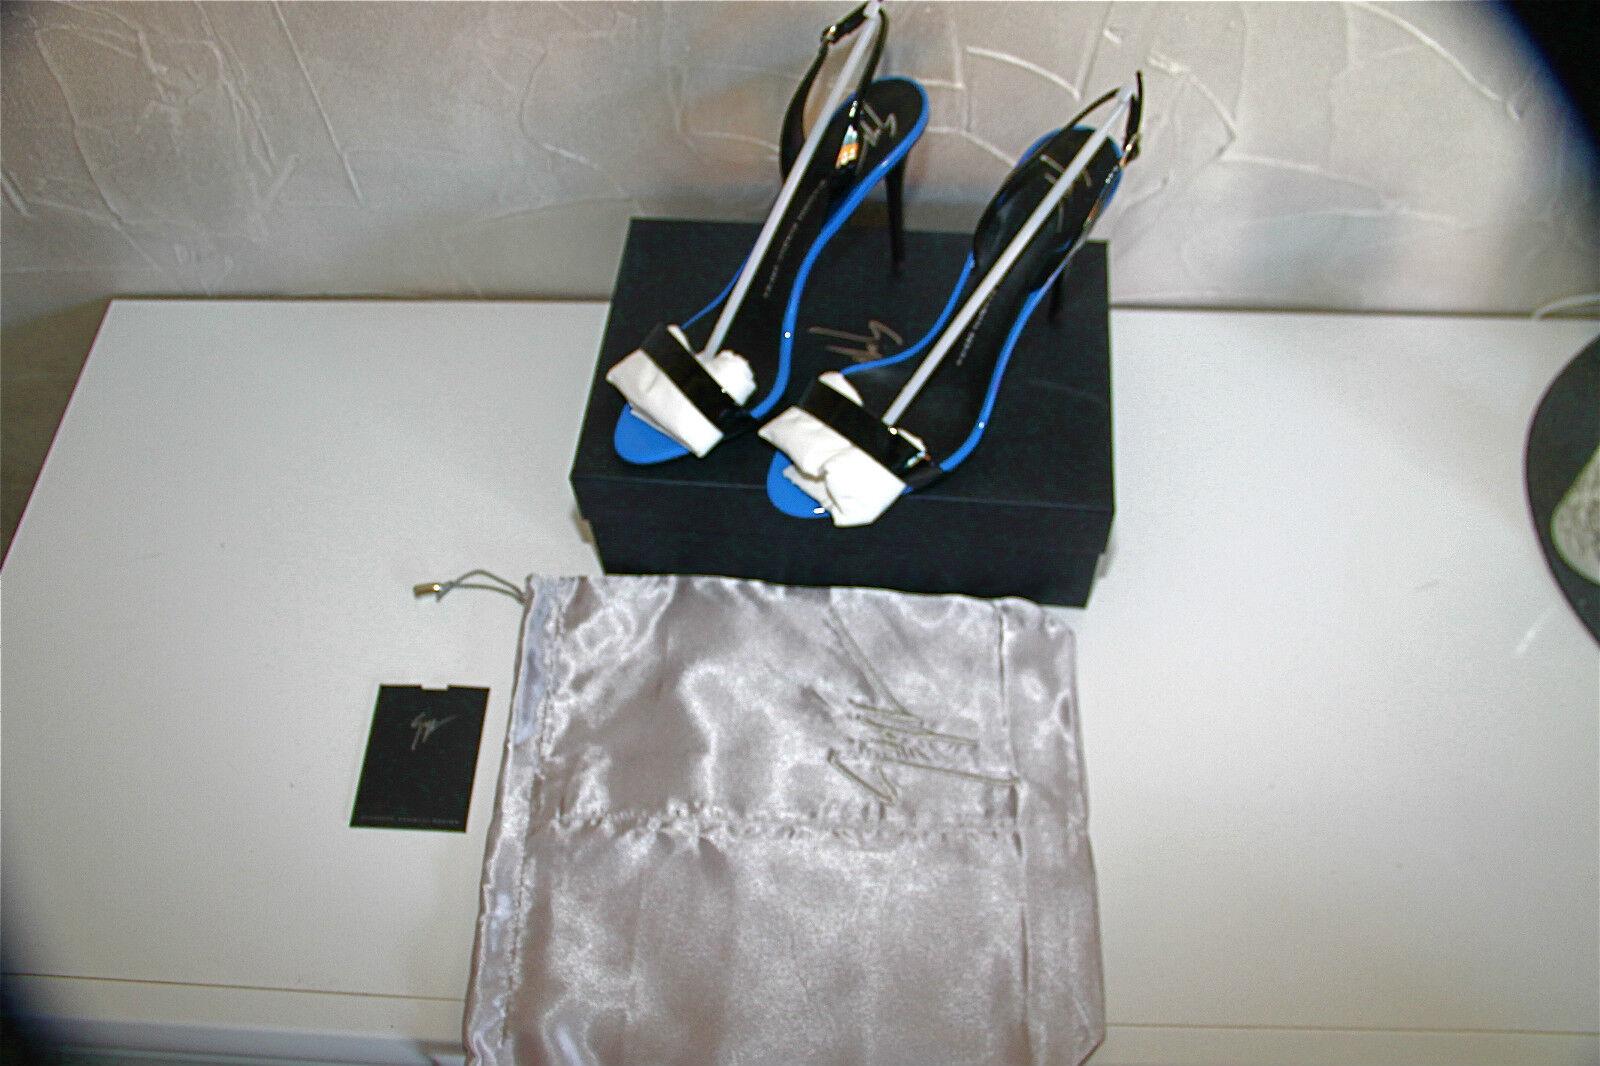 GIUSEPPE ZANOTTI DESIGN Black Sandals patent Leather WoFemme E40089  VALUE 650  E40089 44768d